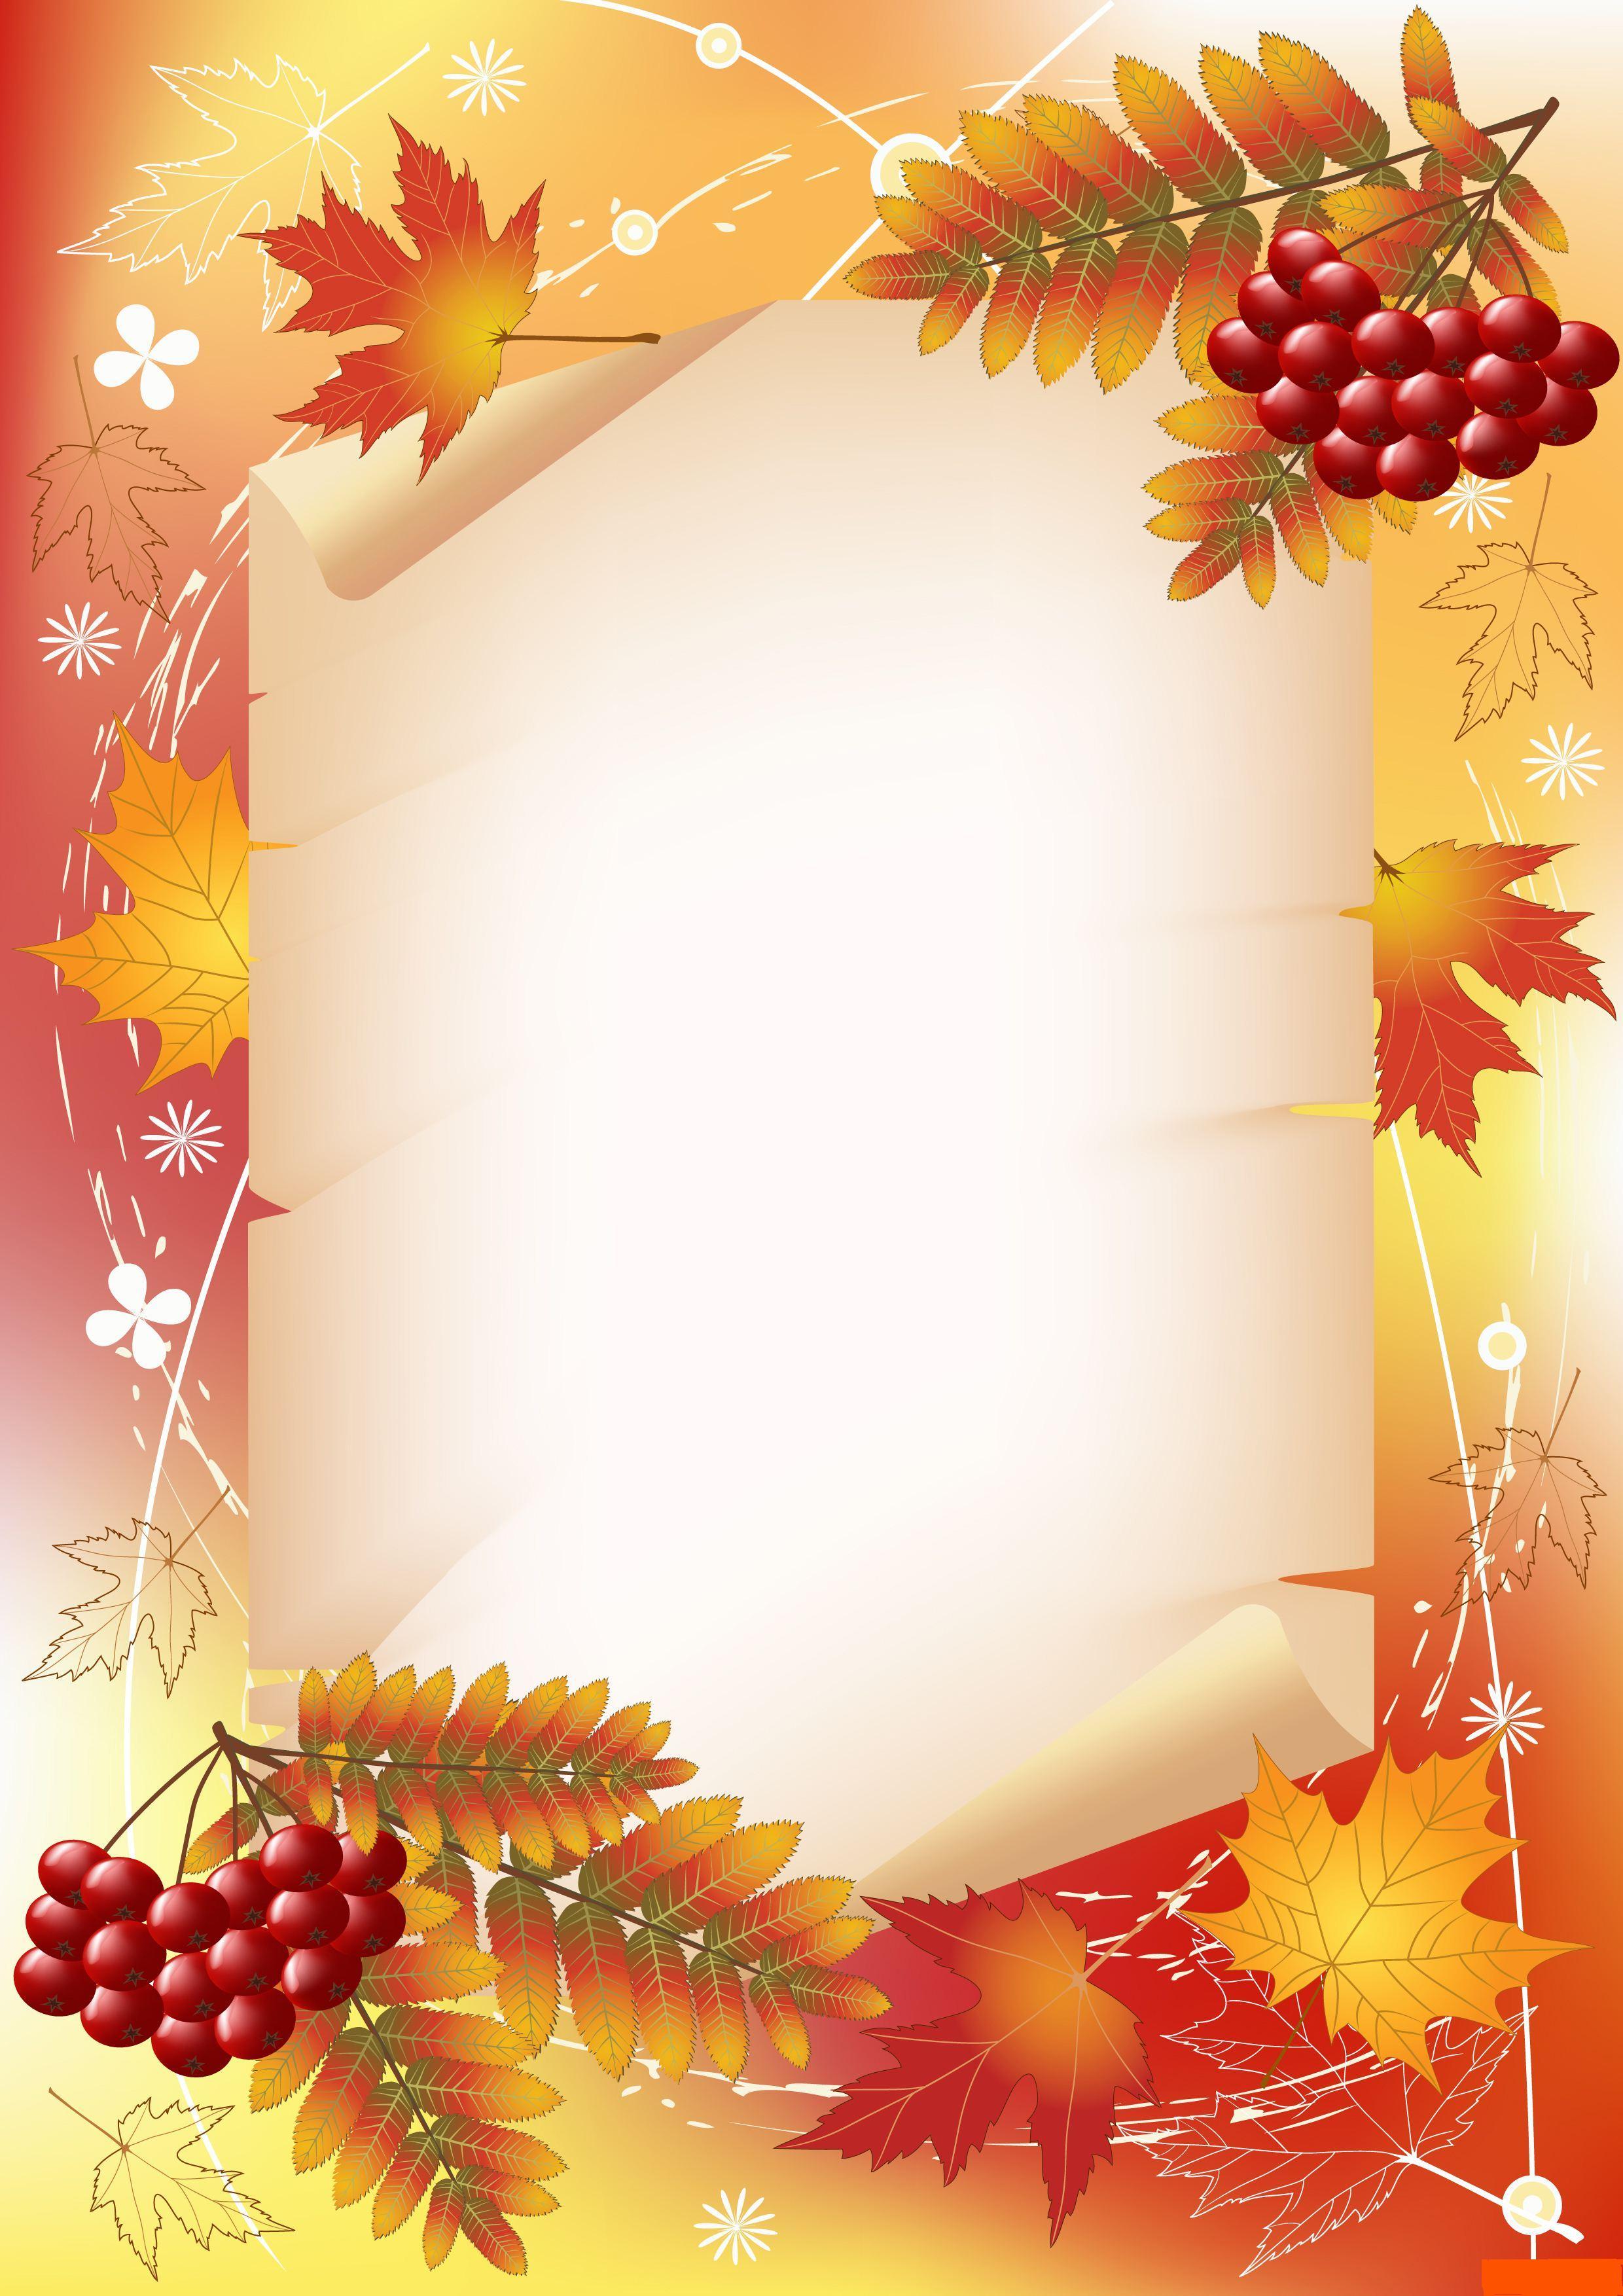 Картинки осень без текста, картинки поздравления